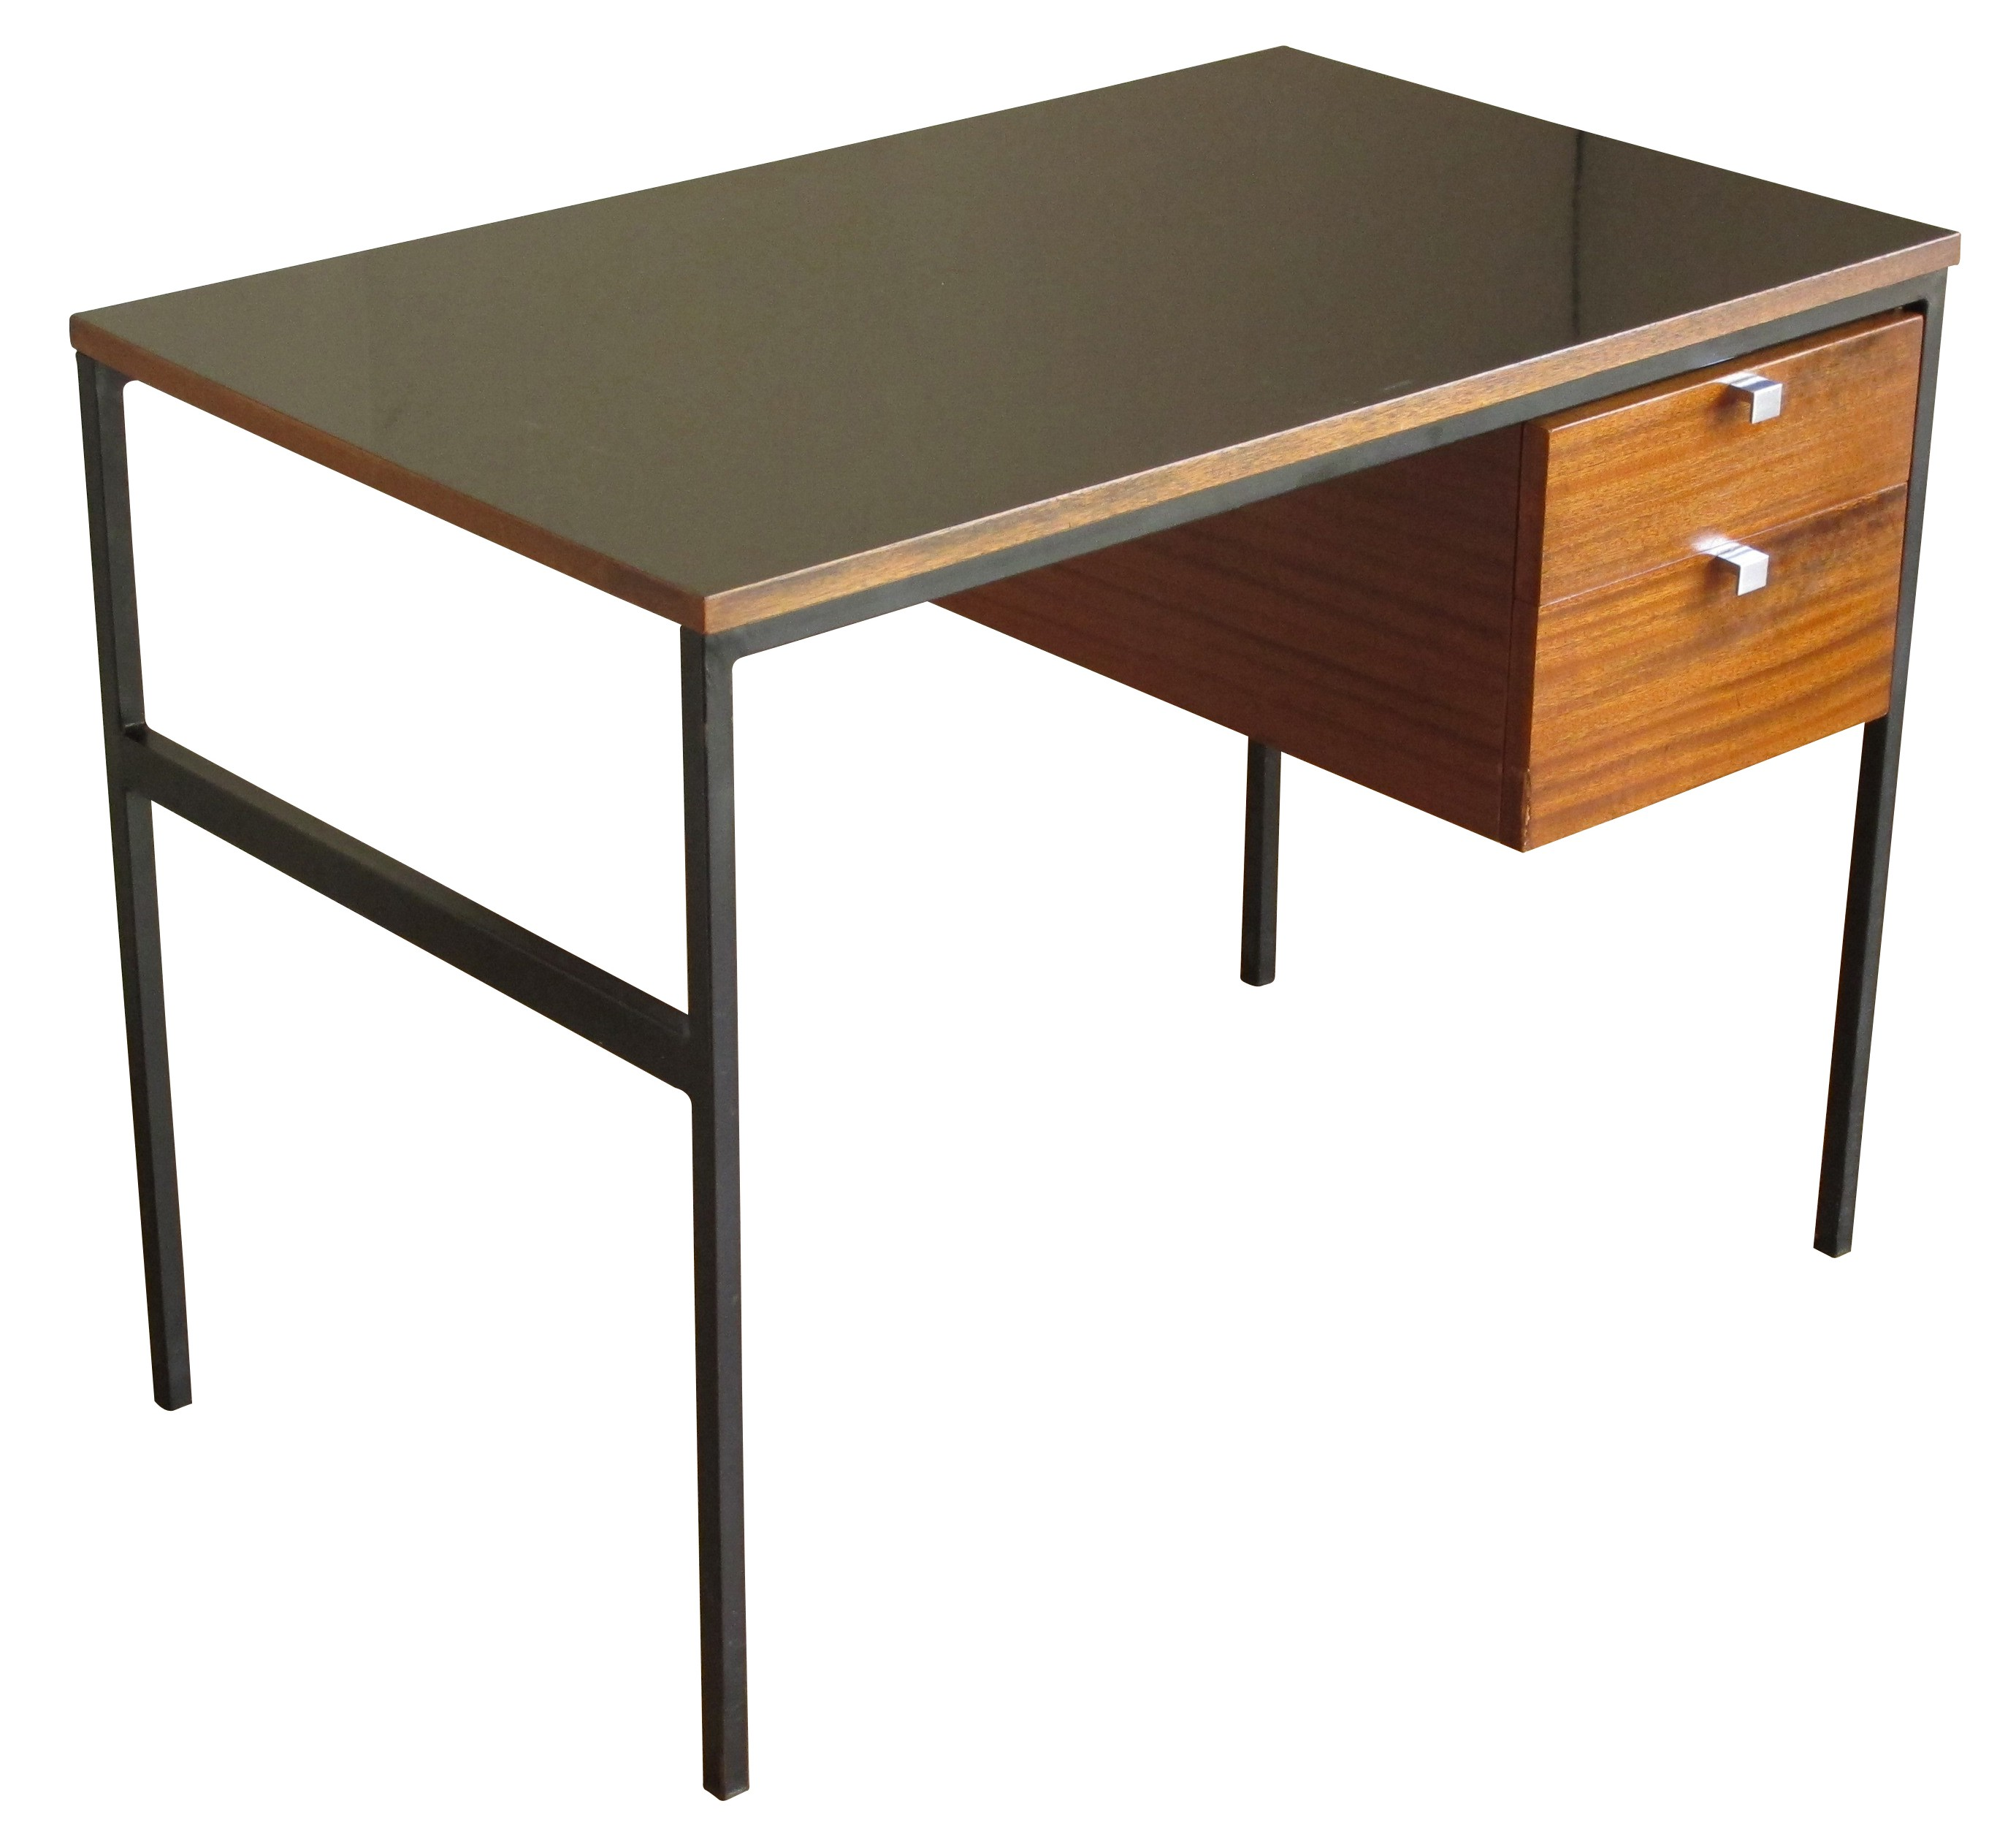 Vintage Desk Pierre Paulin 1954 Design Market